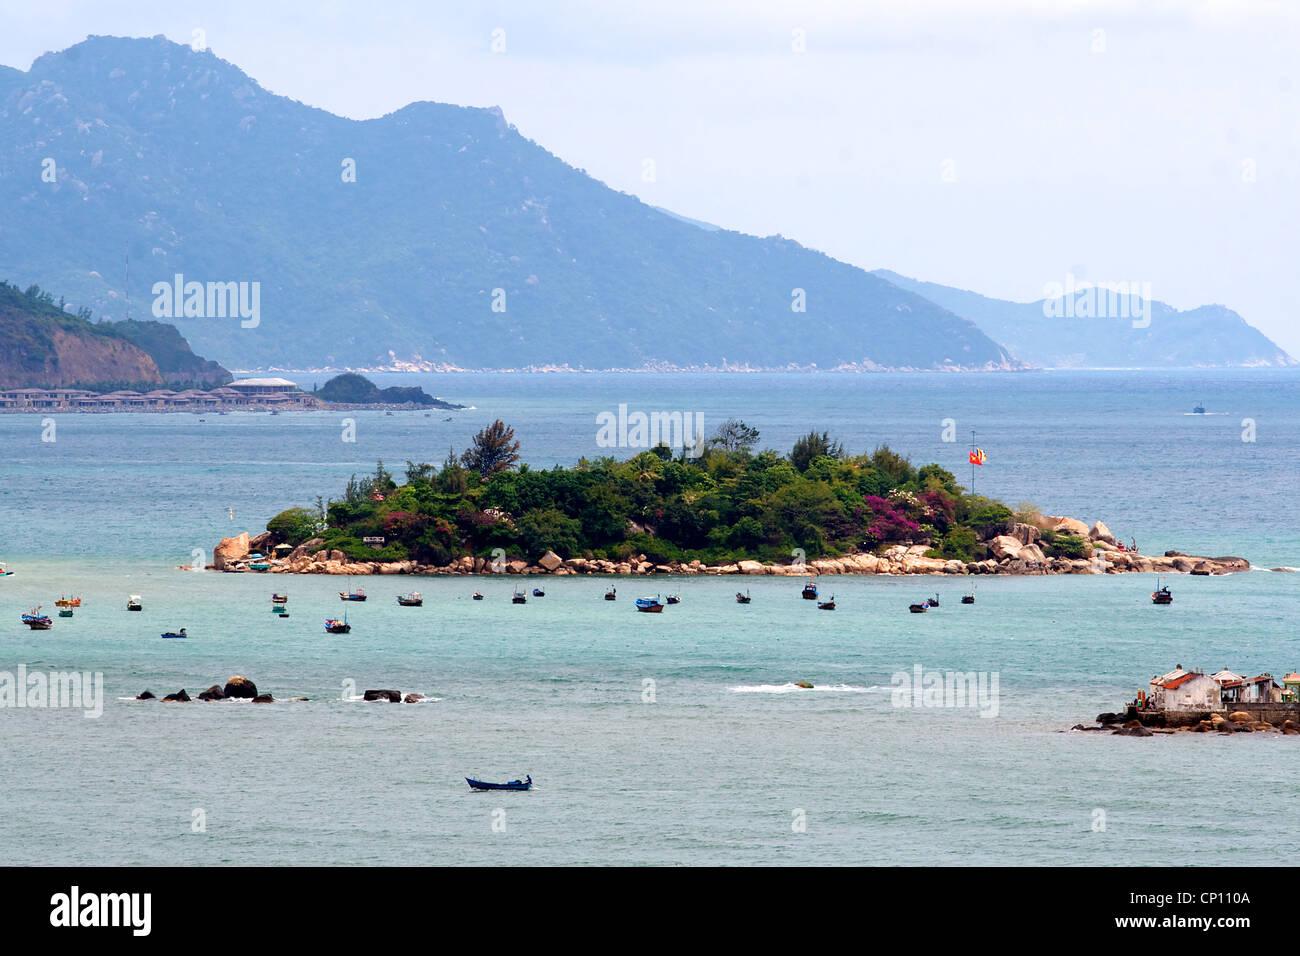 Fishing boats in the bay in Nha Trang, Vietnam. - Stock Image